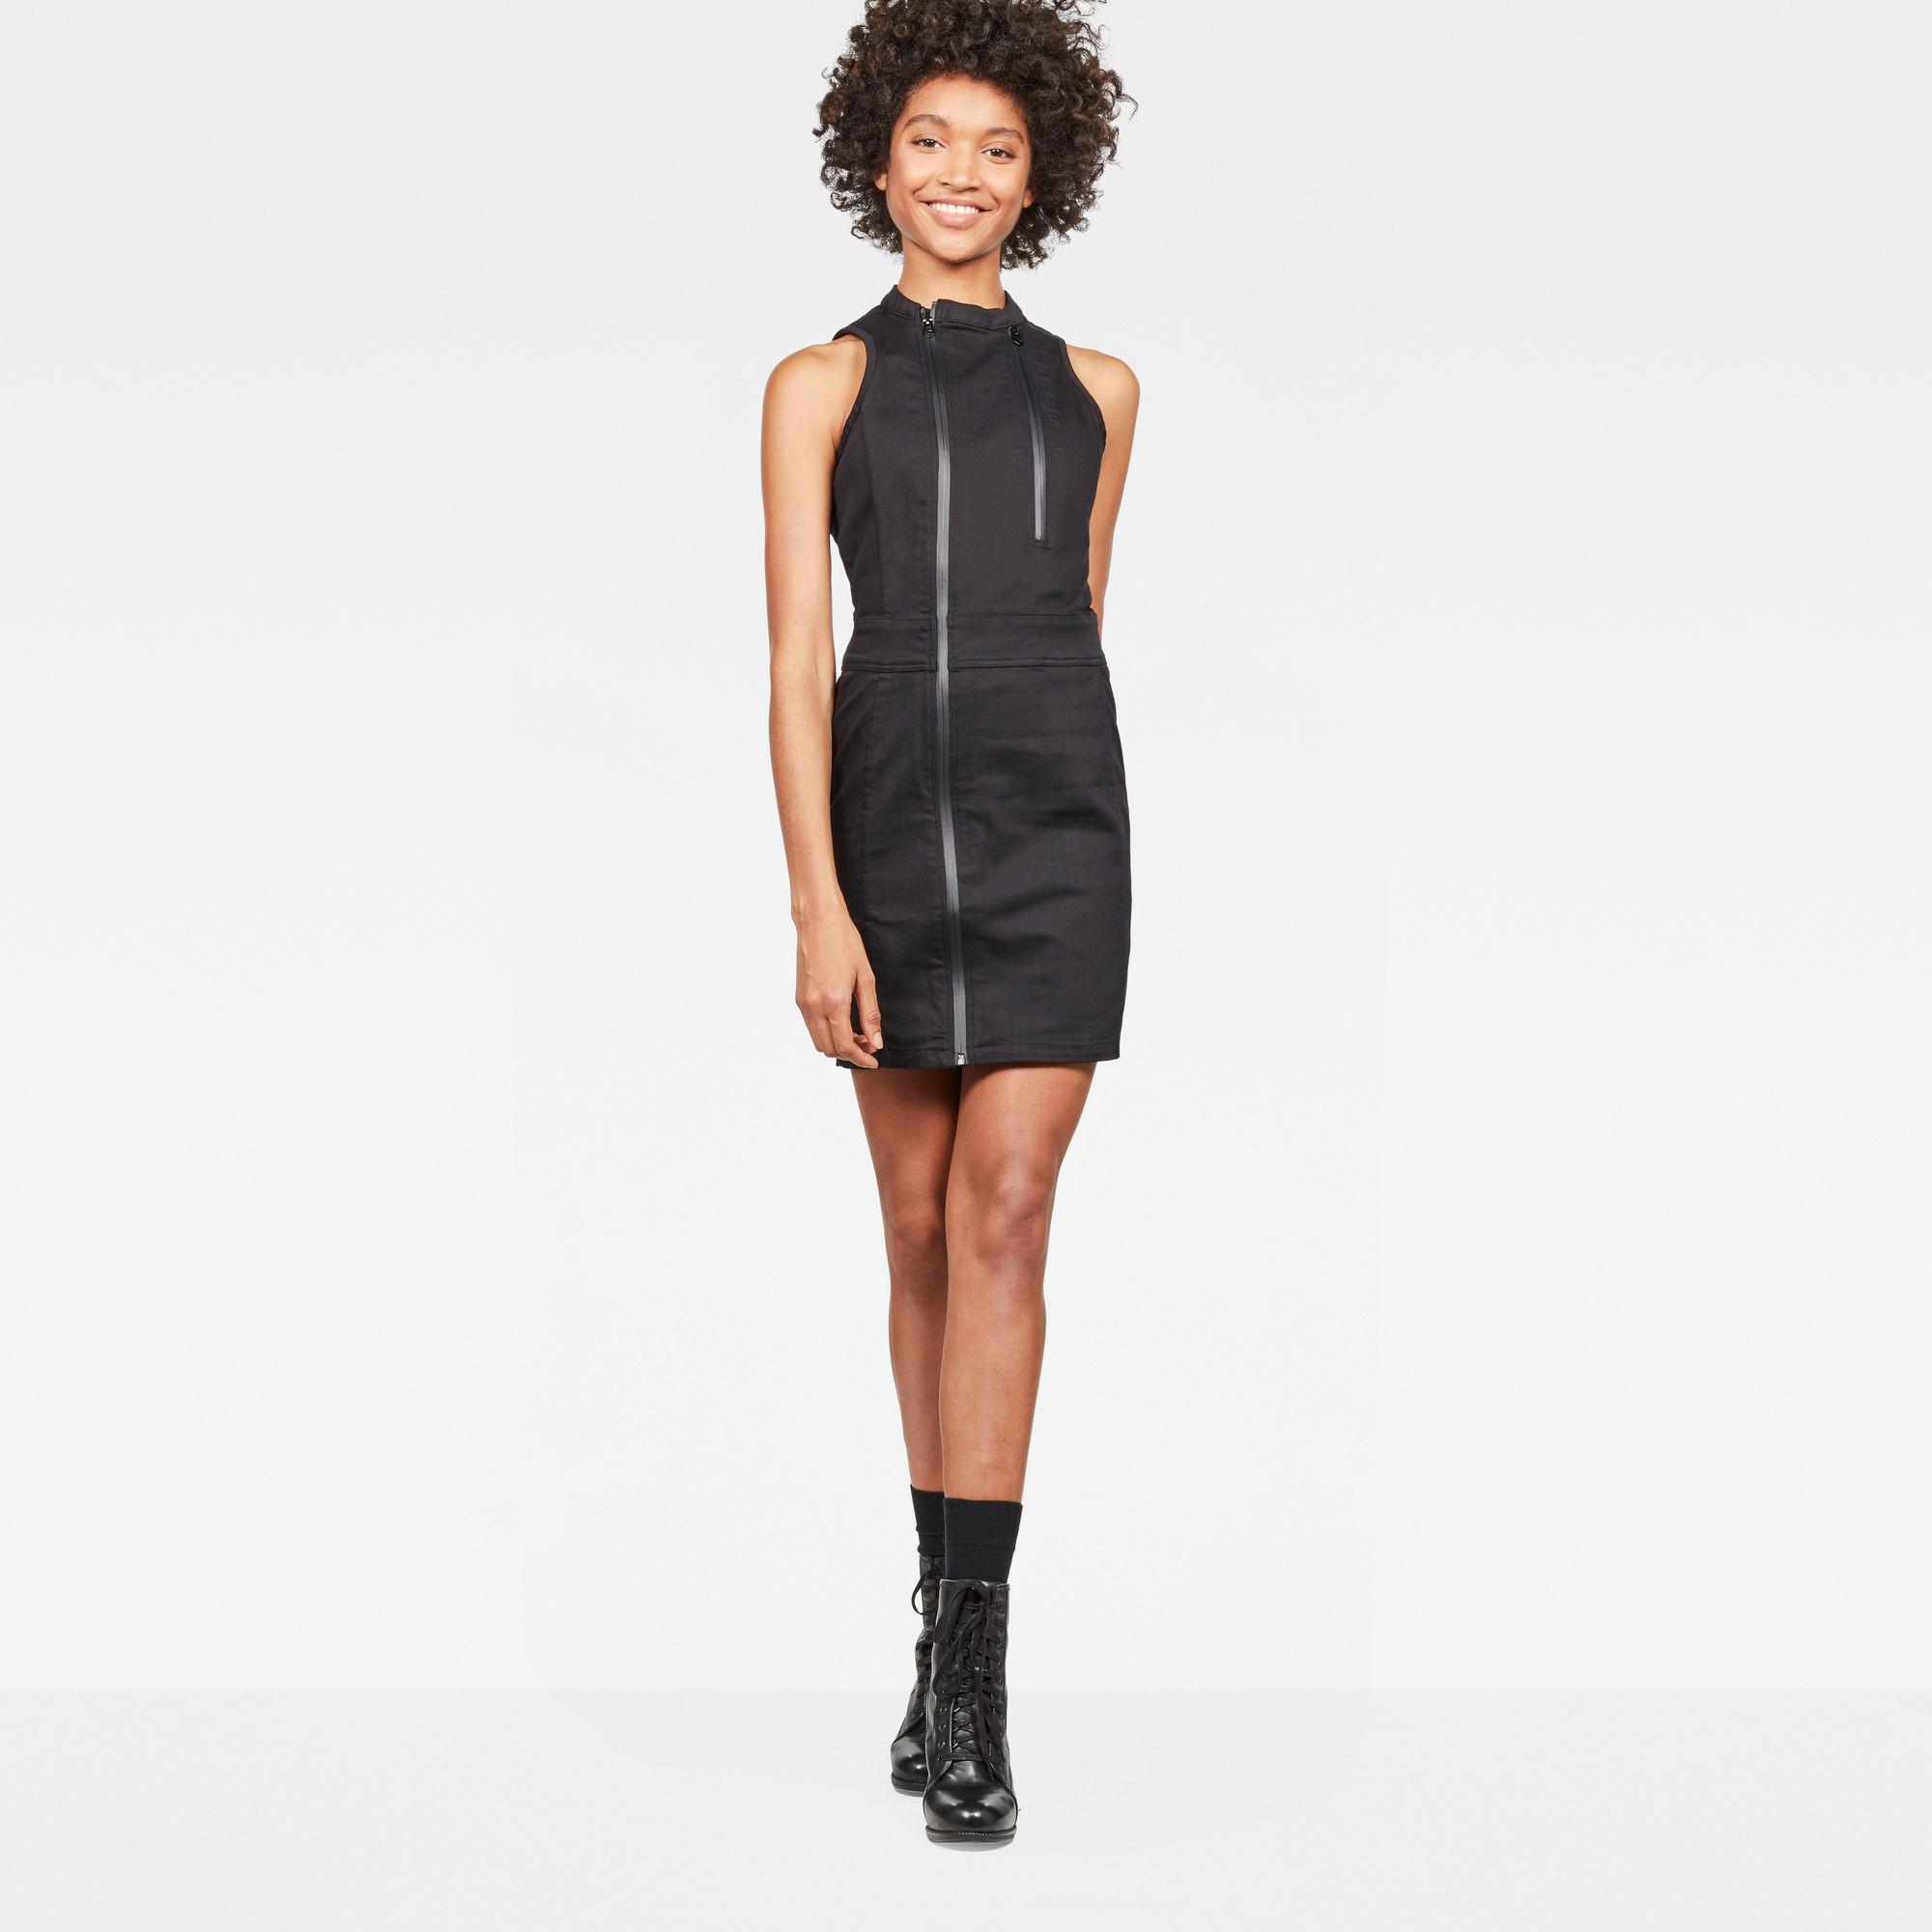 Lynn Lunar Slim Sleeveless Dress